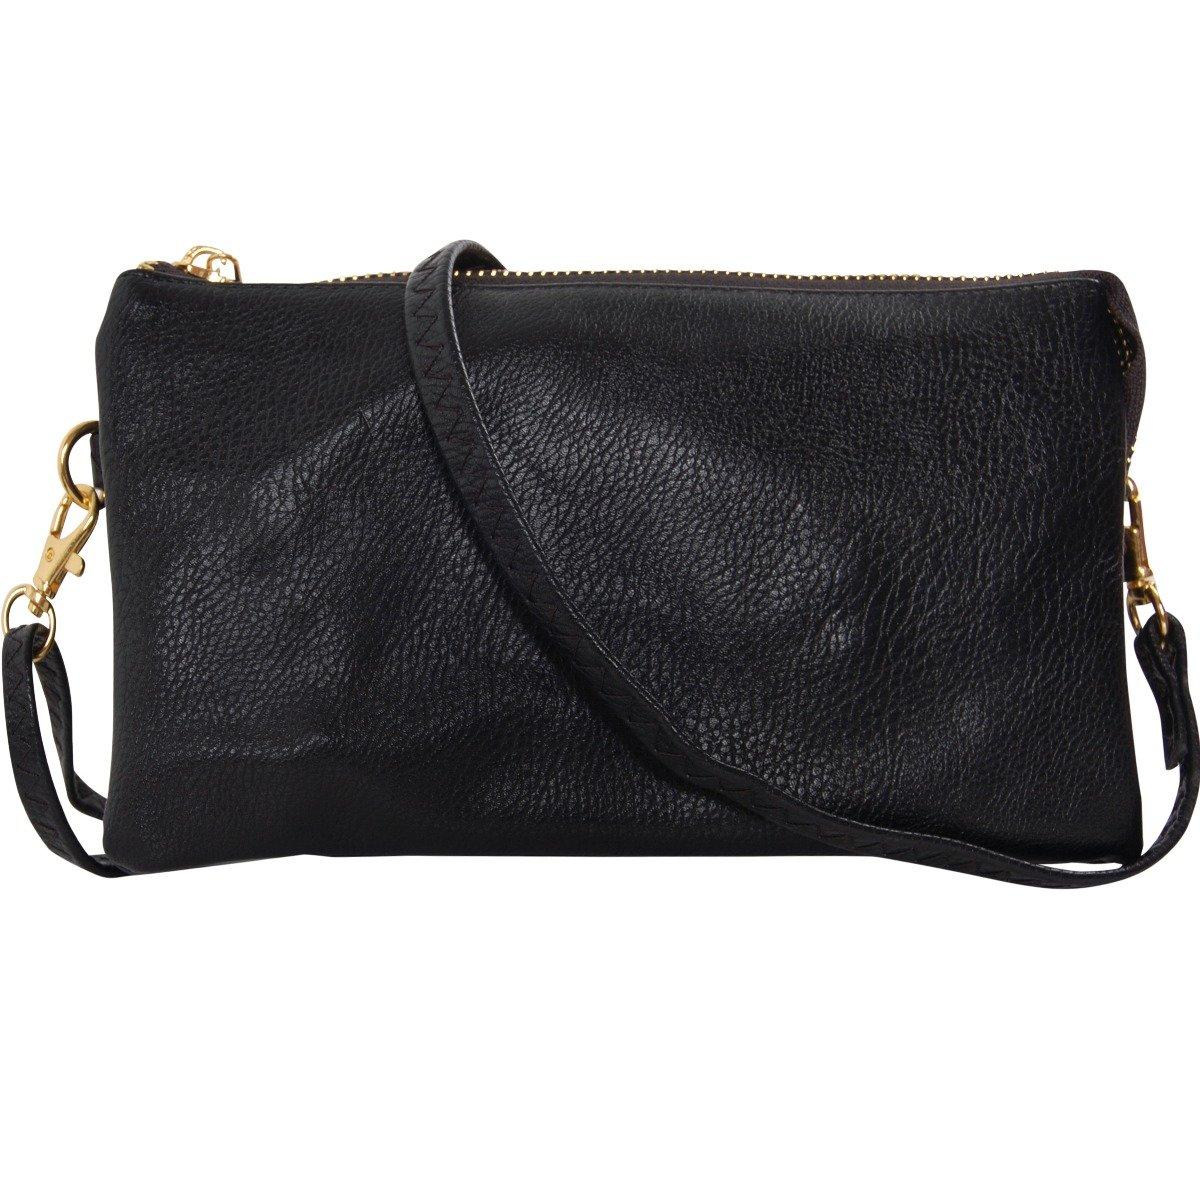 e29300a6d Humble Chic Vegan Leather Small Crossbody Bag or Wristlet Clutch Purse,  Includes Adjustable Shoulder and Wrist Straps, Black: Handbags: Amazon.com